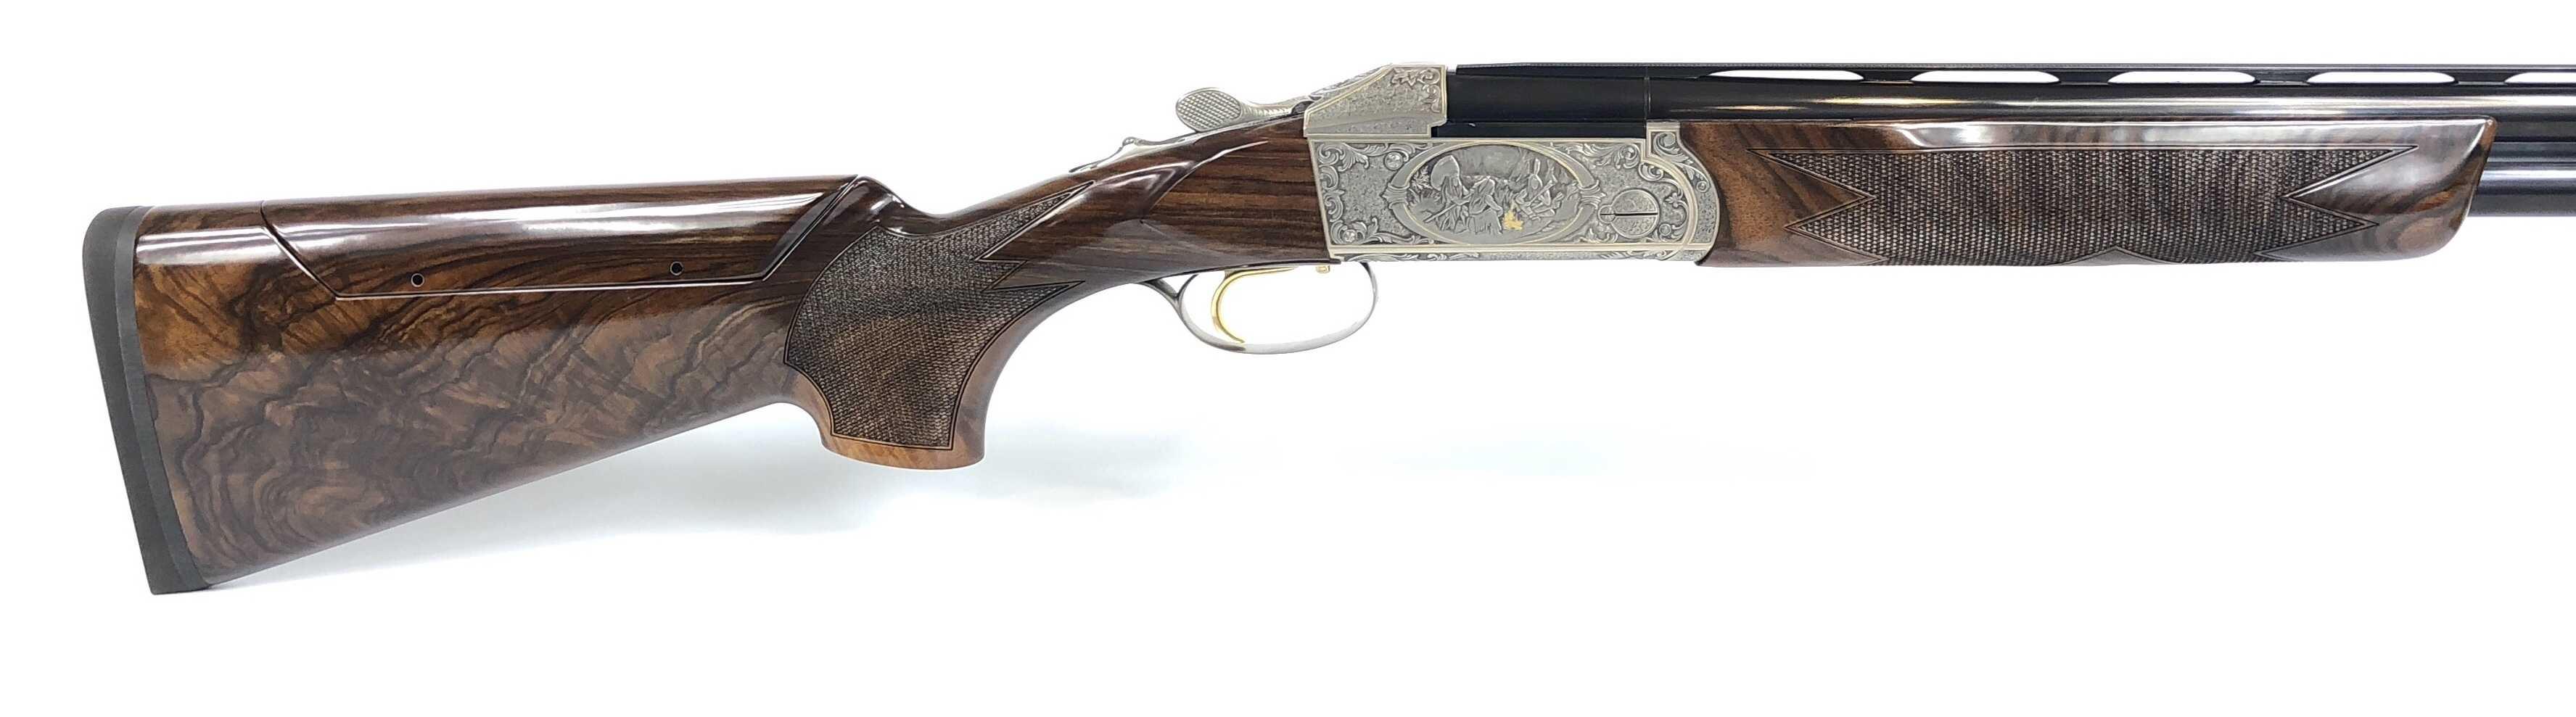 Kings Own Scottish Borderers Shotgun /& Air Rifle Cleaning and Care Kit FREE ENGRAVING BKG28